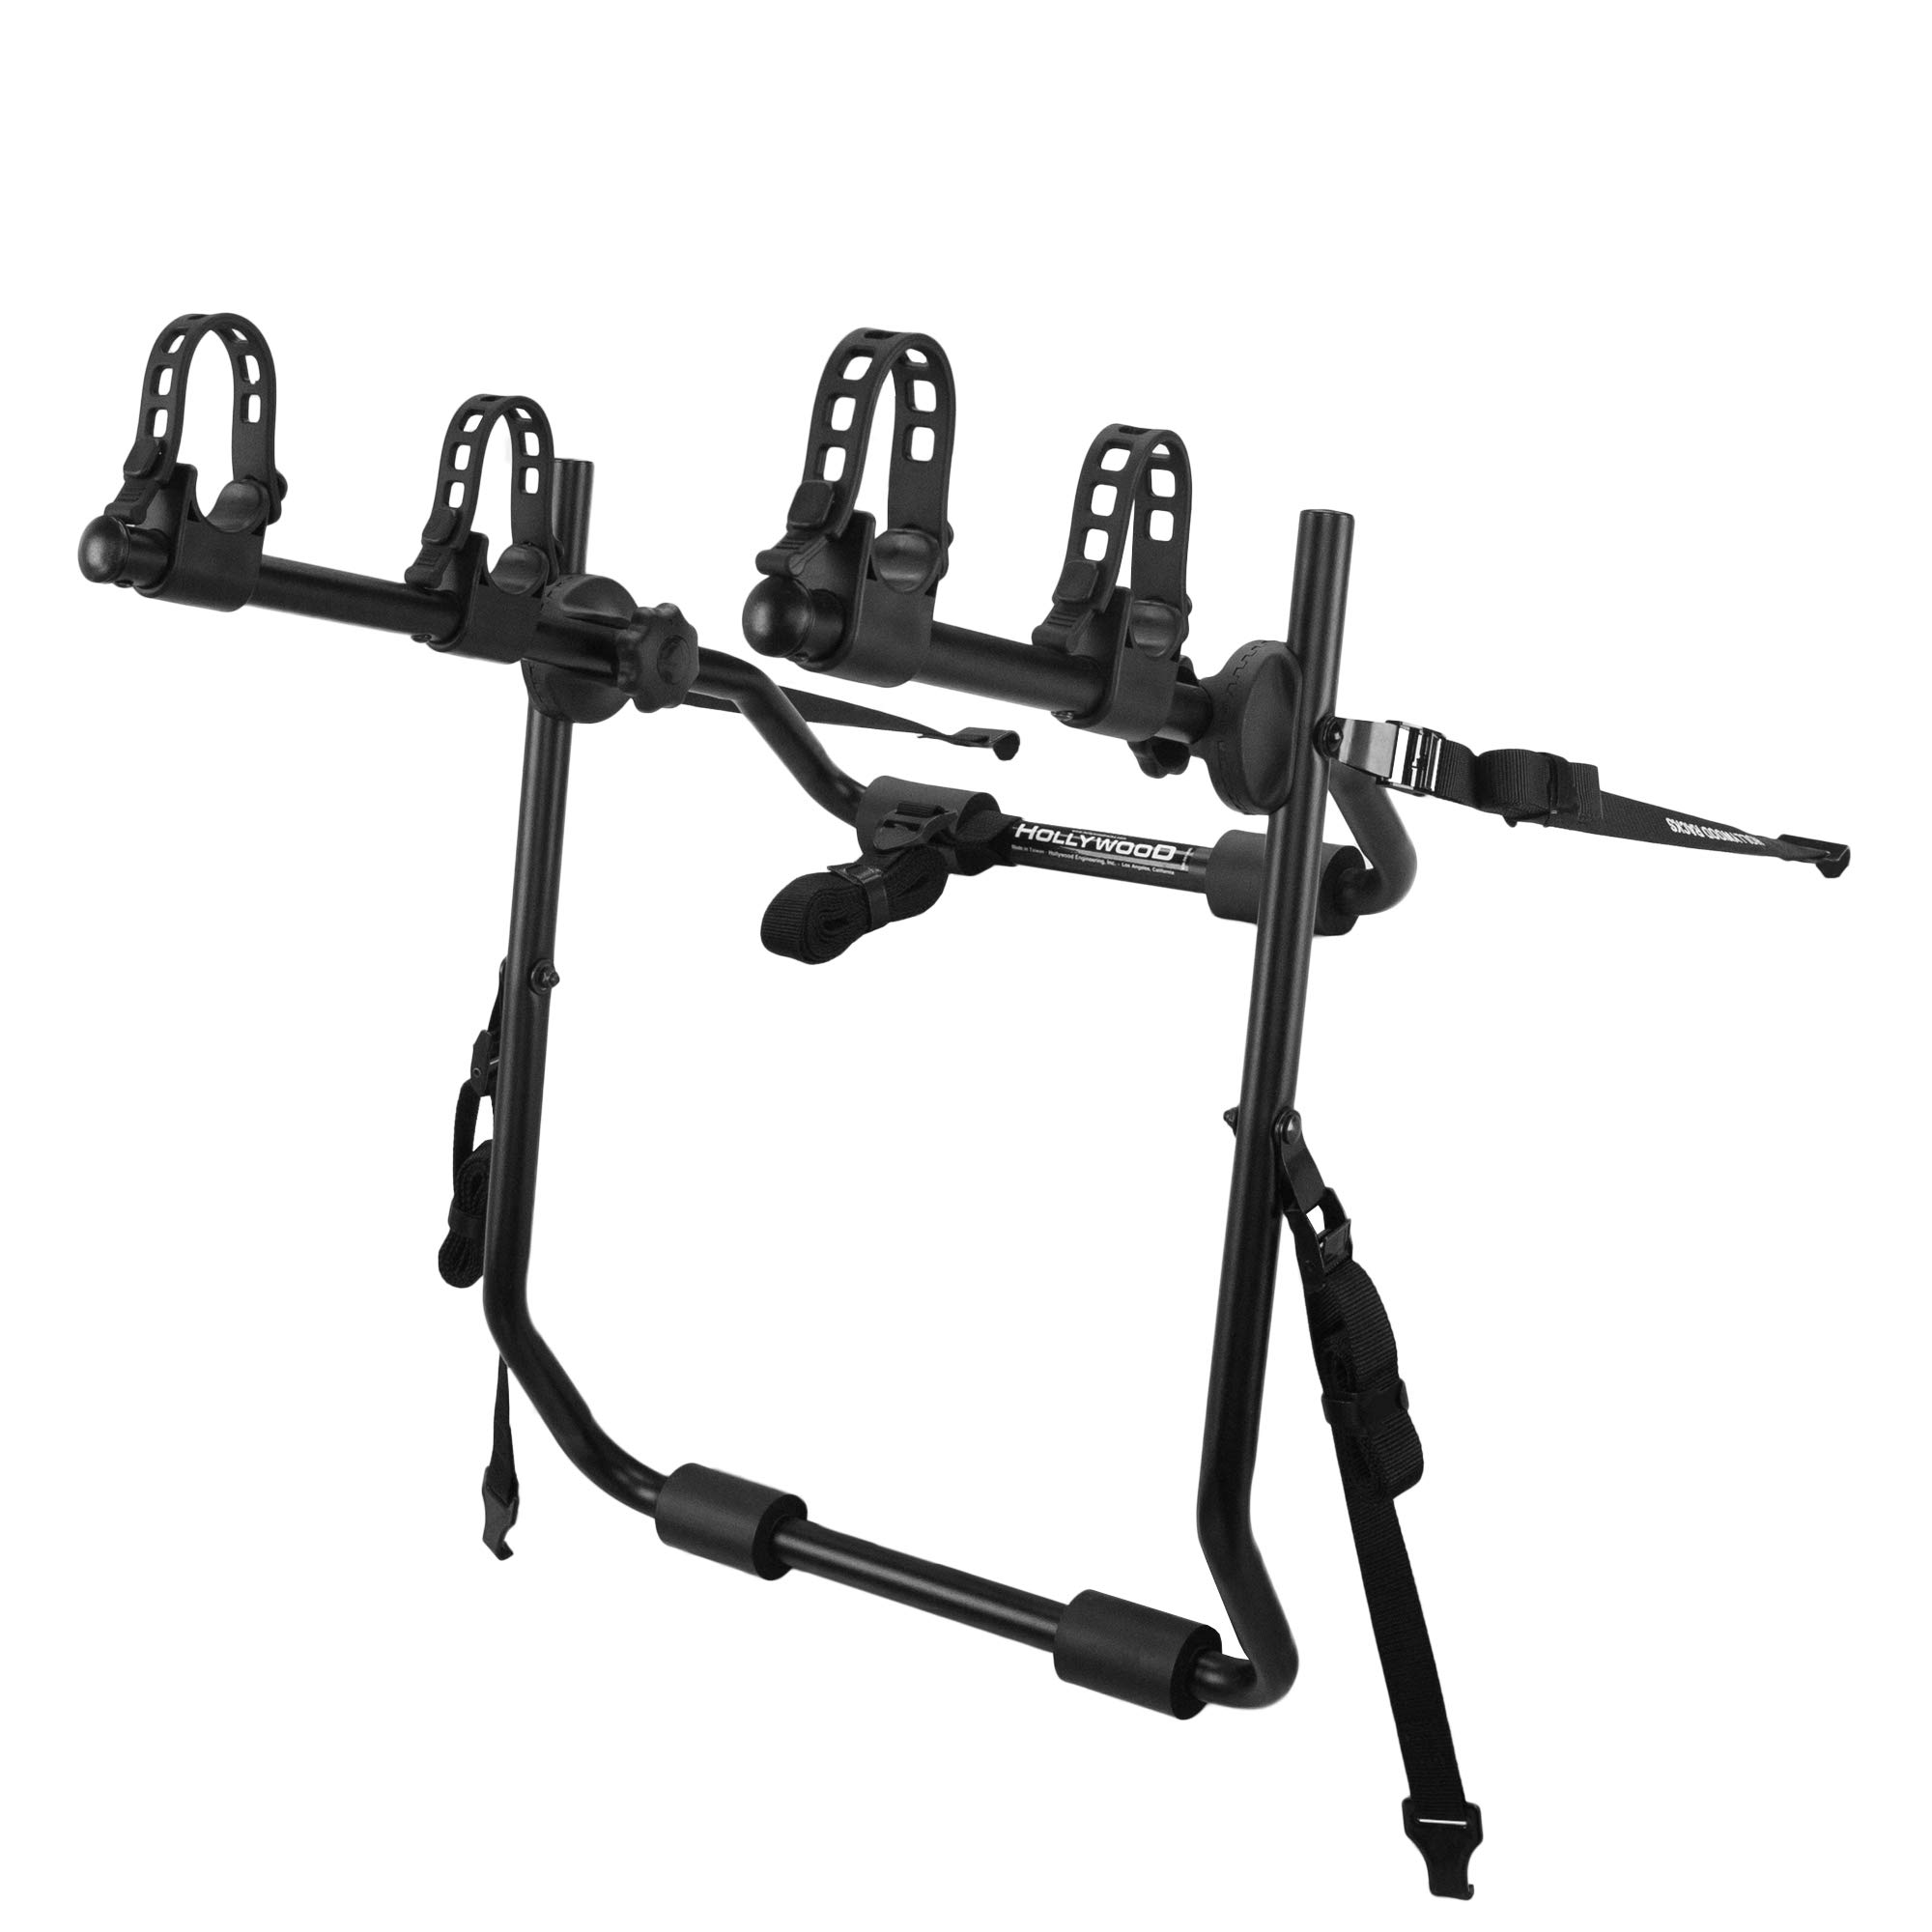 Hollywood Racks Express 2 Two Bike Trunk Rack (Black)